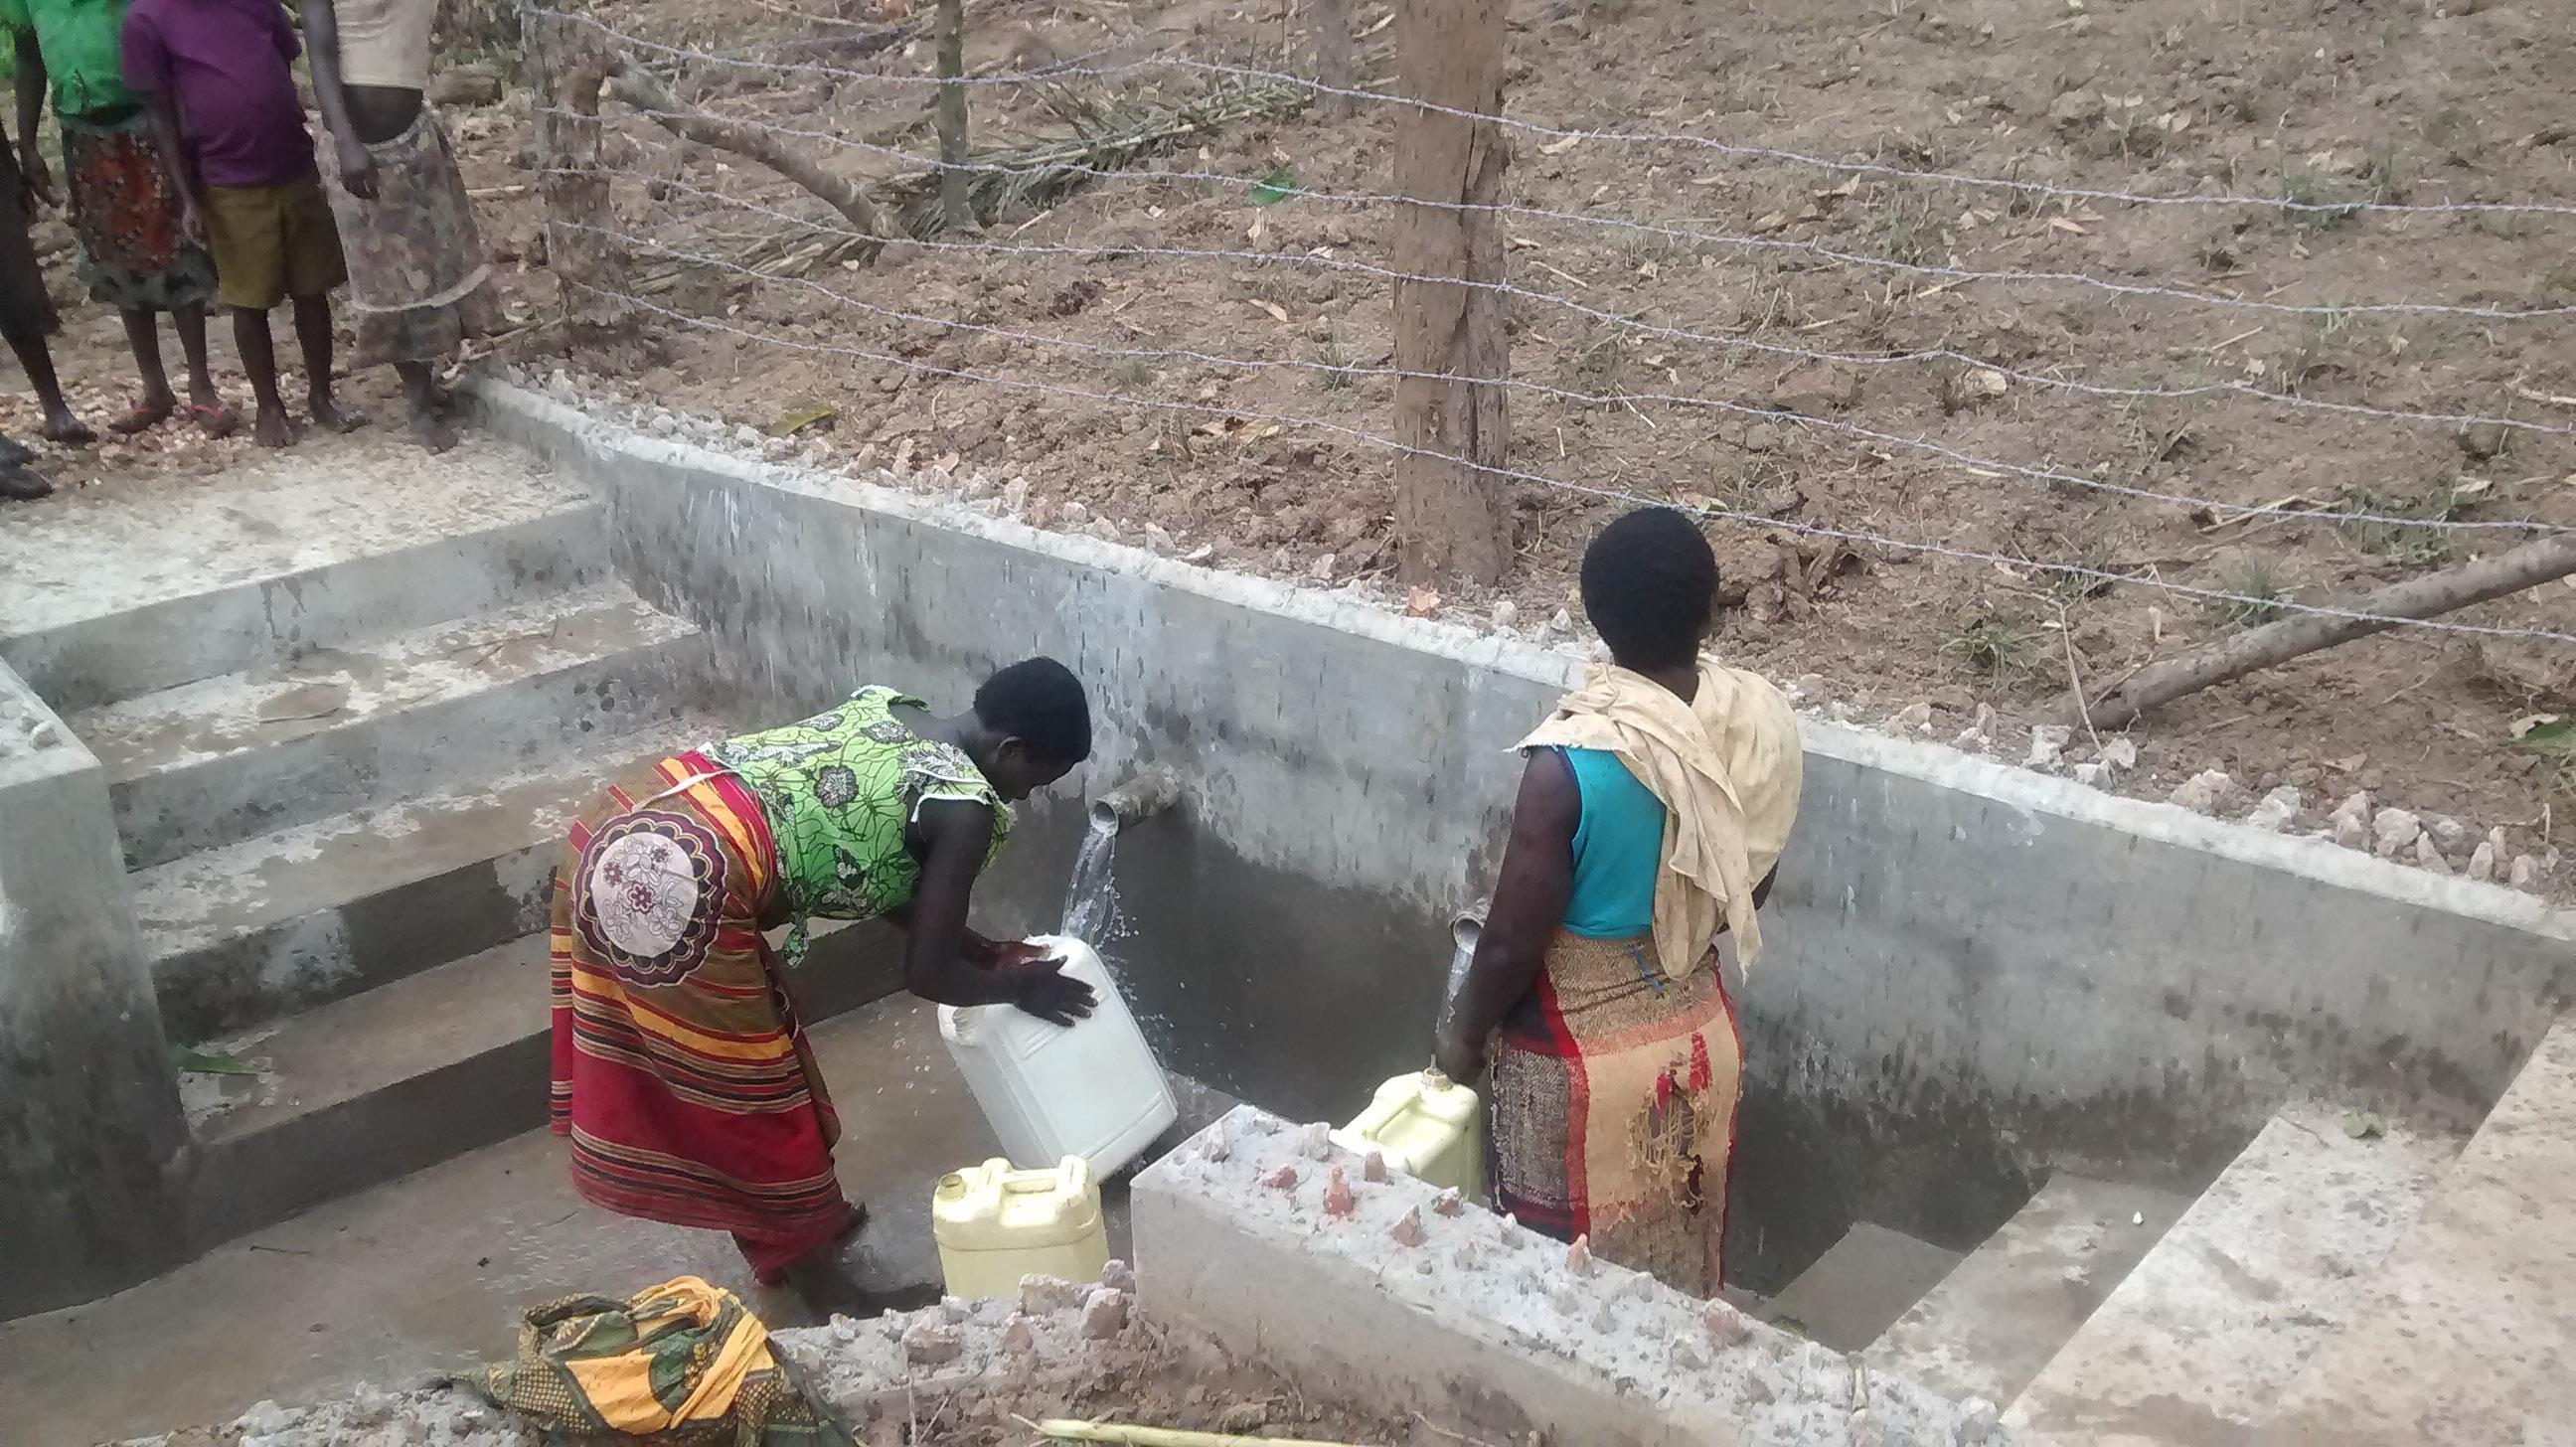 Rwempisi-Zakayo Community